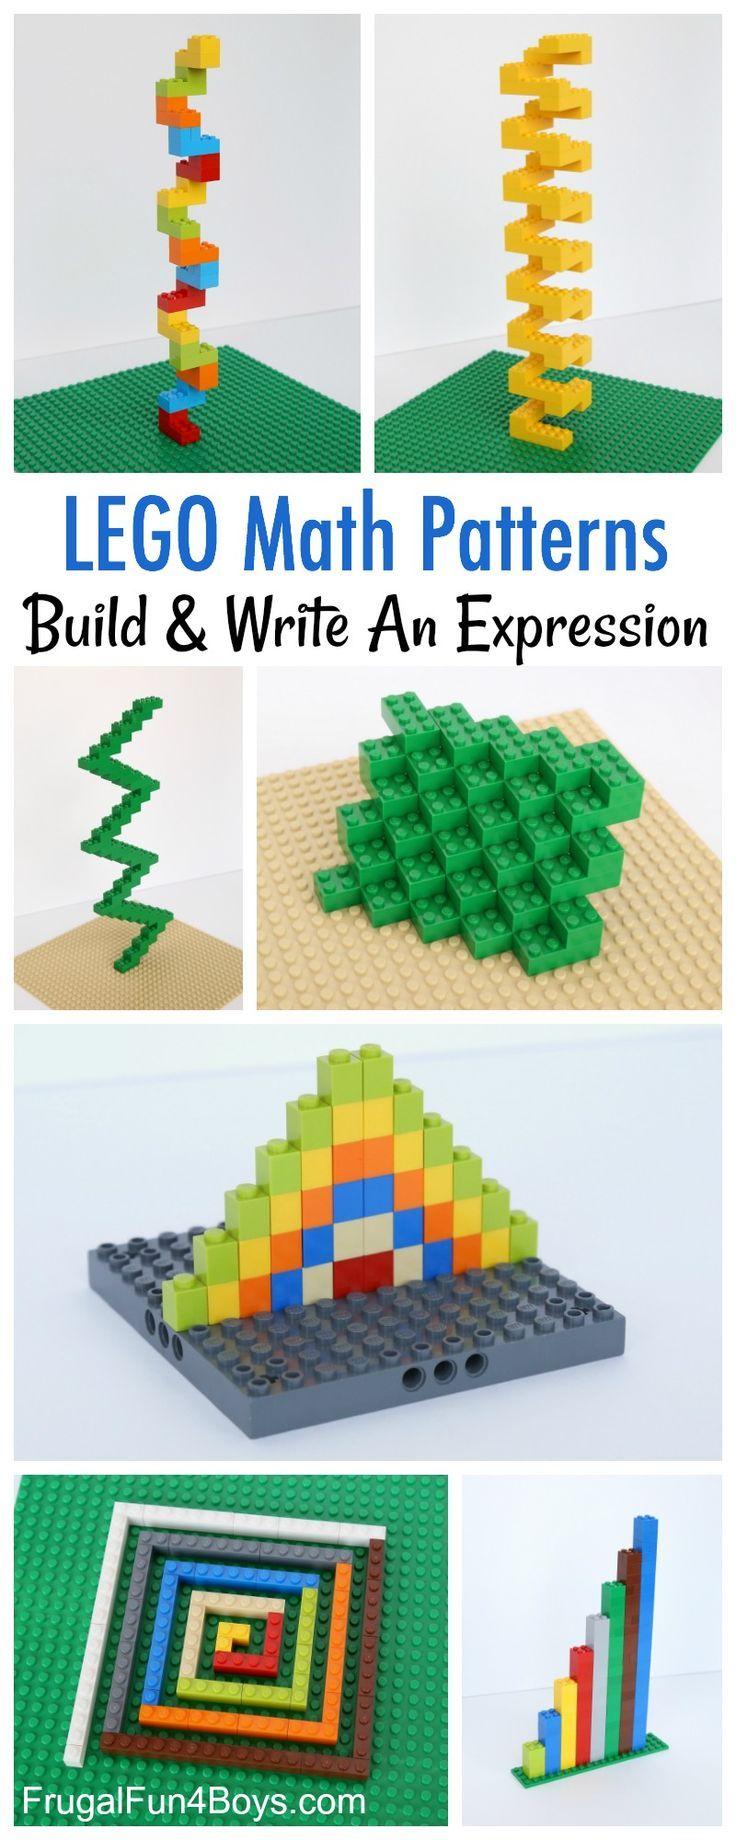 Create mathematical patterns with LEGO bricks #make #mathematical #pattern #stones